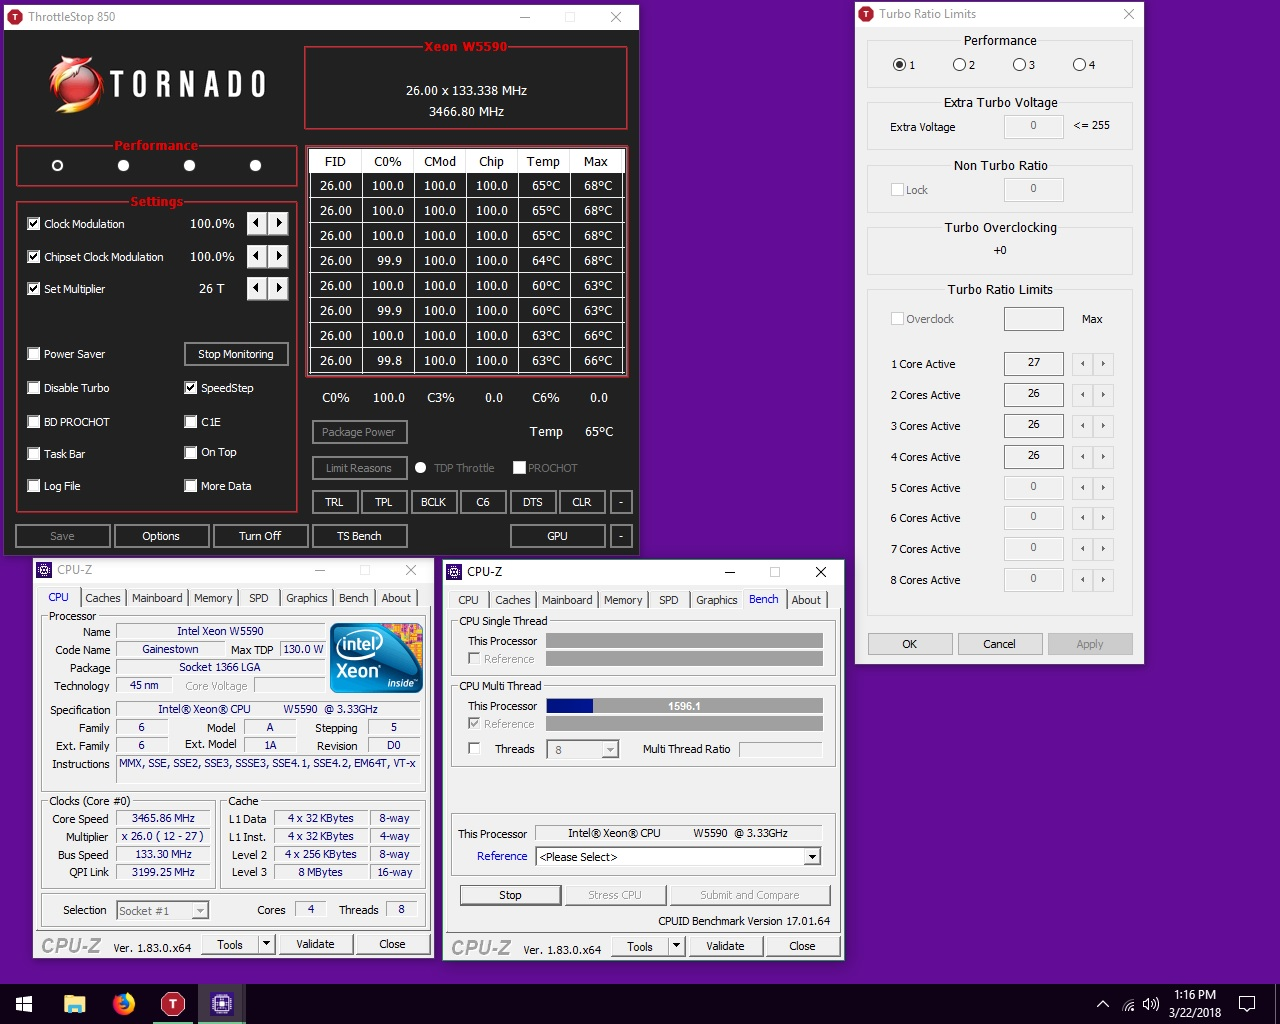 Throttlestop overclocking Desktop PCs   Page 6   TechPowerUp